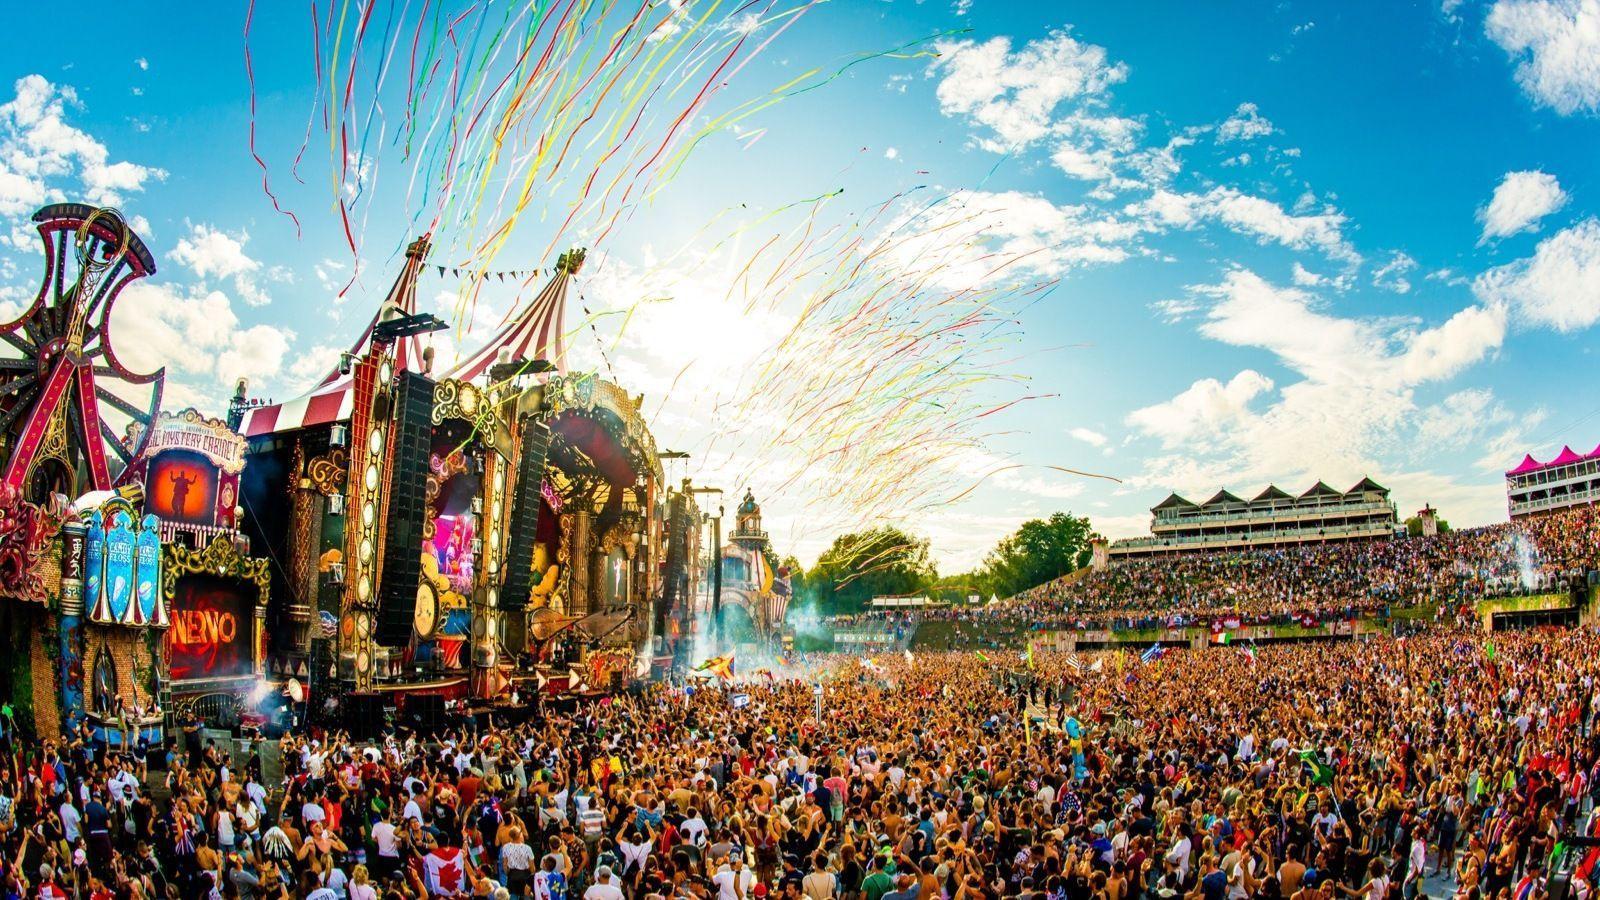 Tomorrowland Festival Wallpapers Top Free Tomorrowland